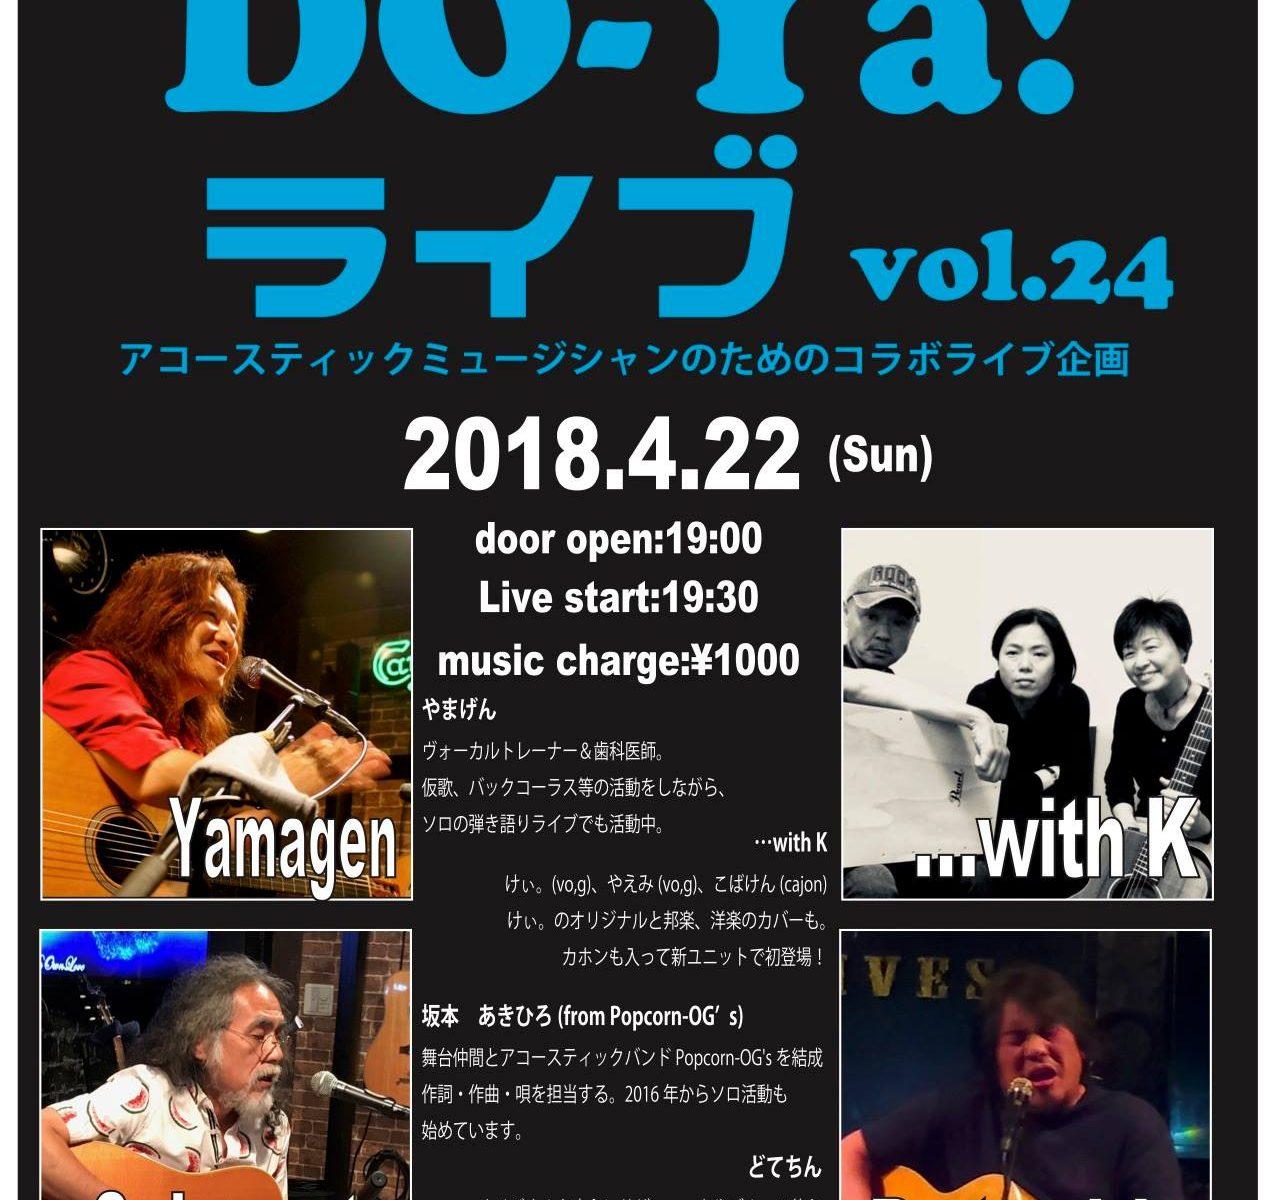 DO-Ya!ライブ vol.24